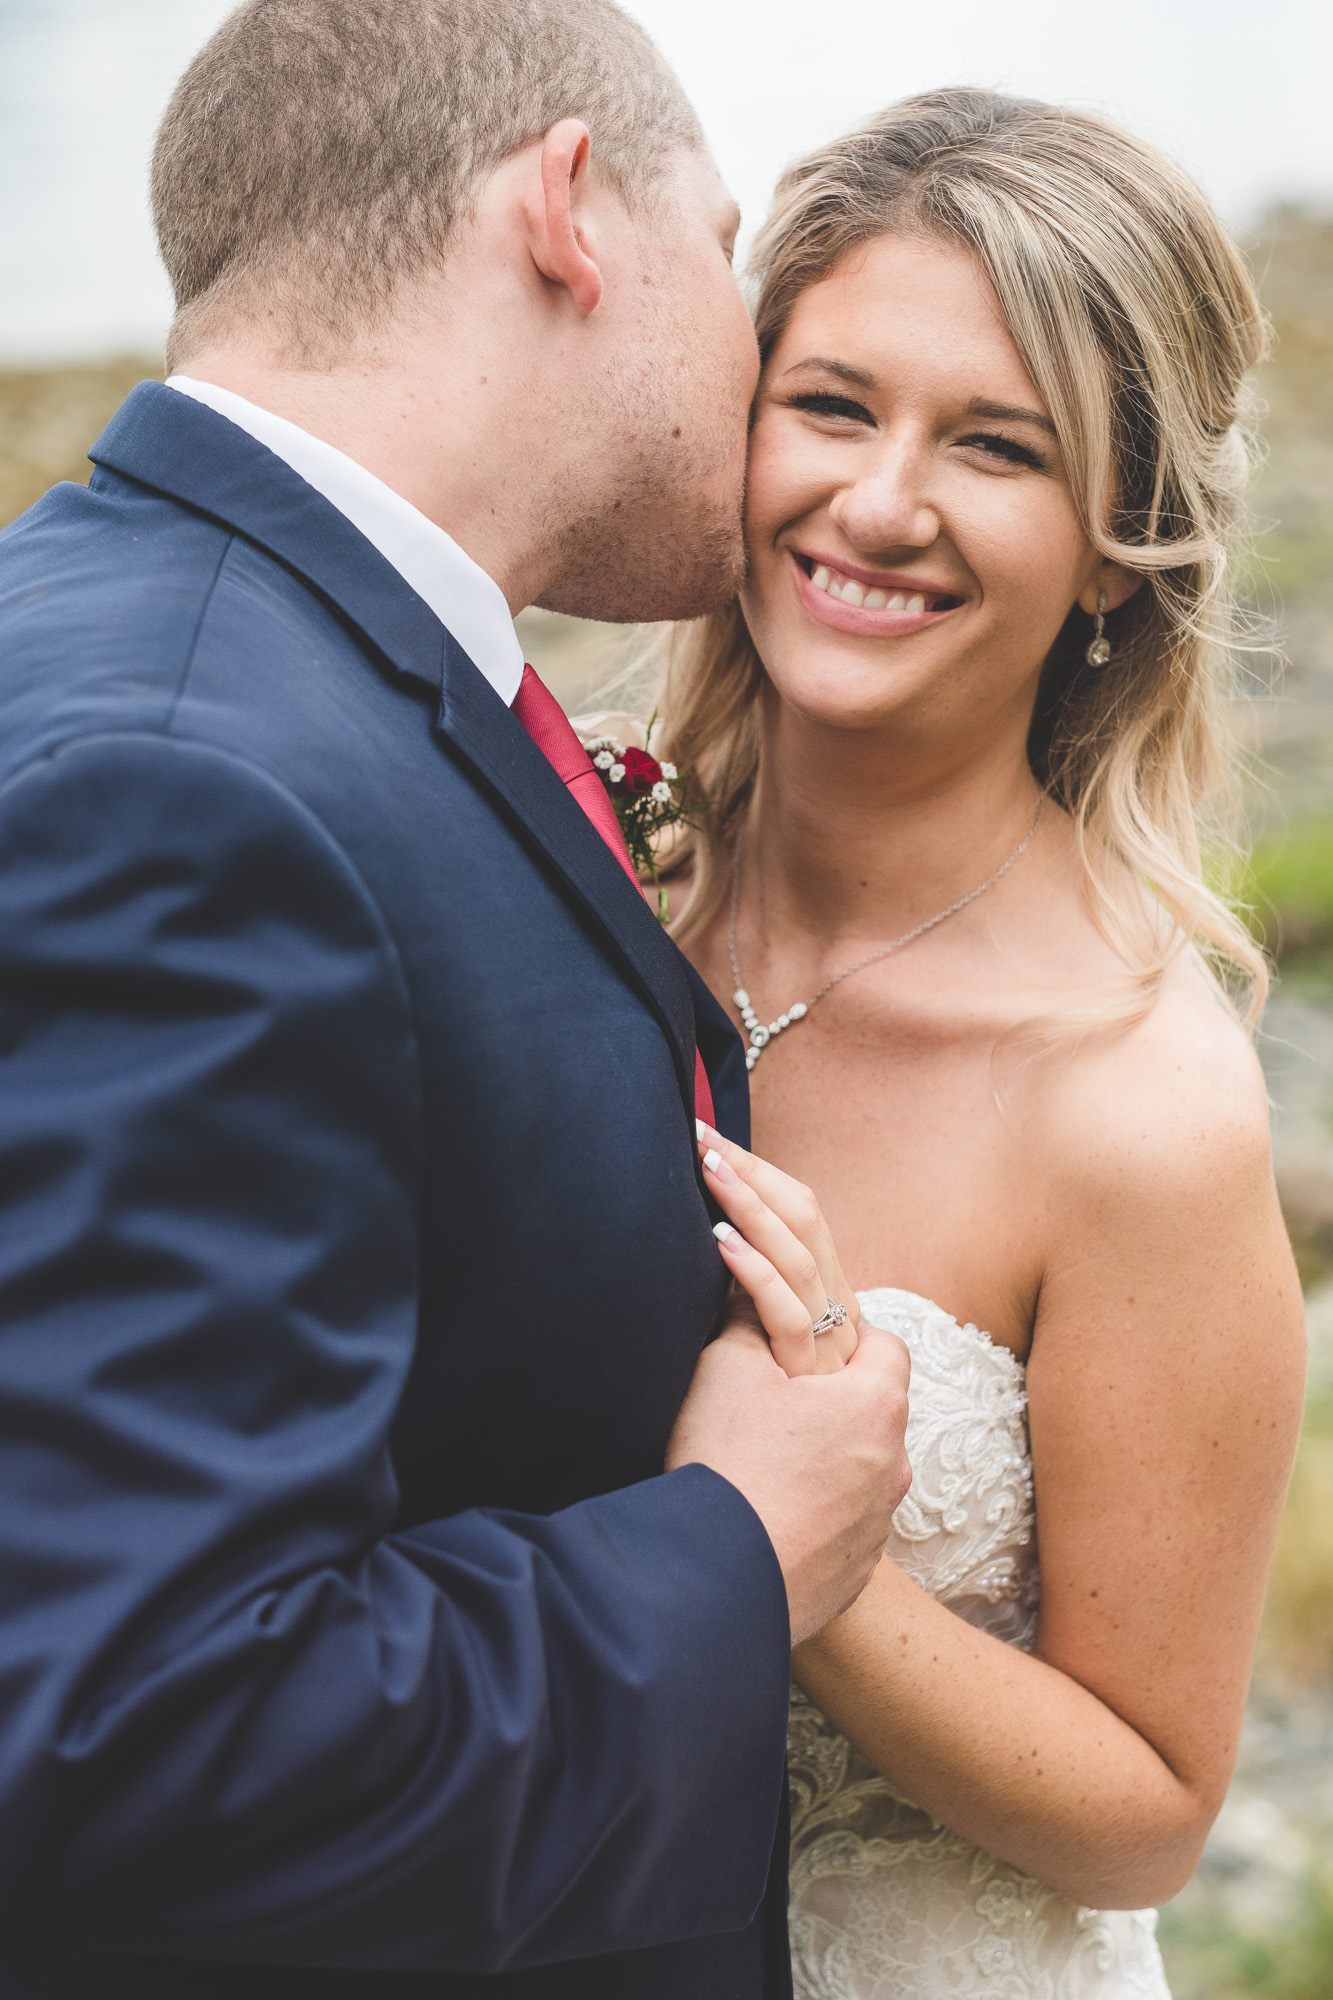 bride-smiling-while-groom-kisses-cheek